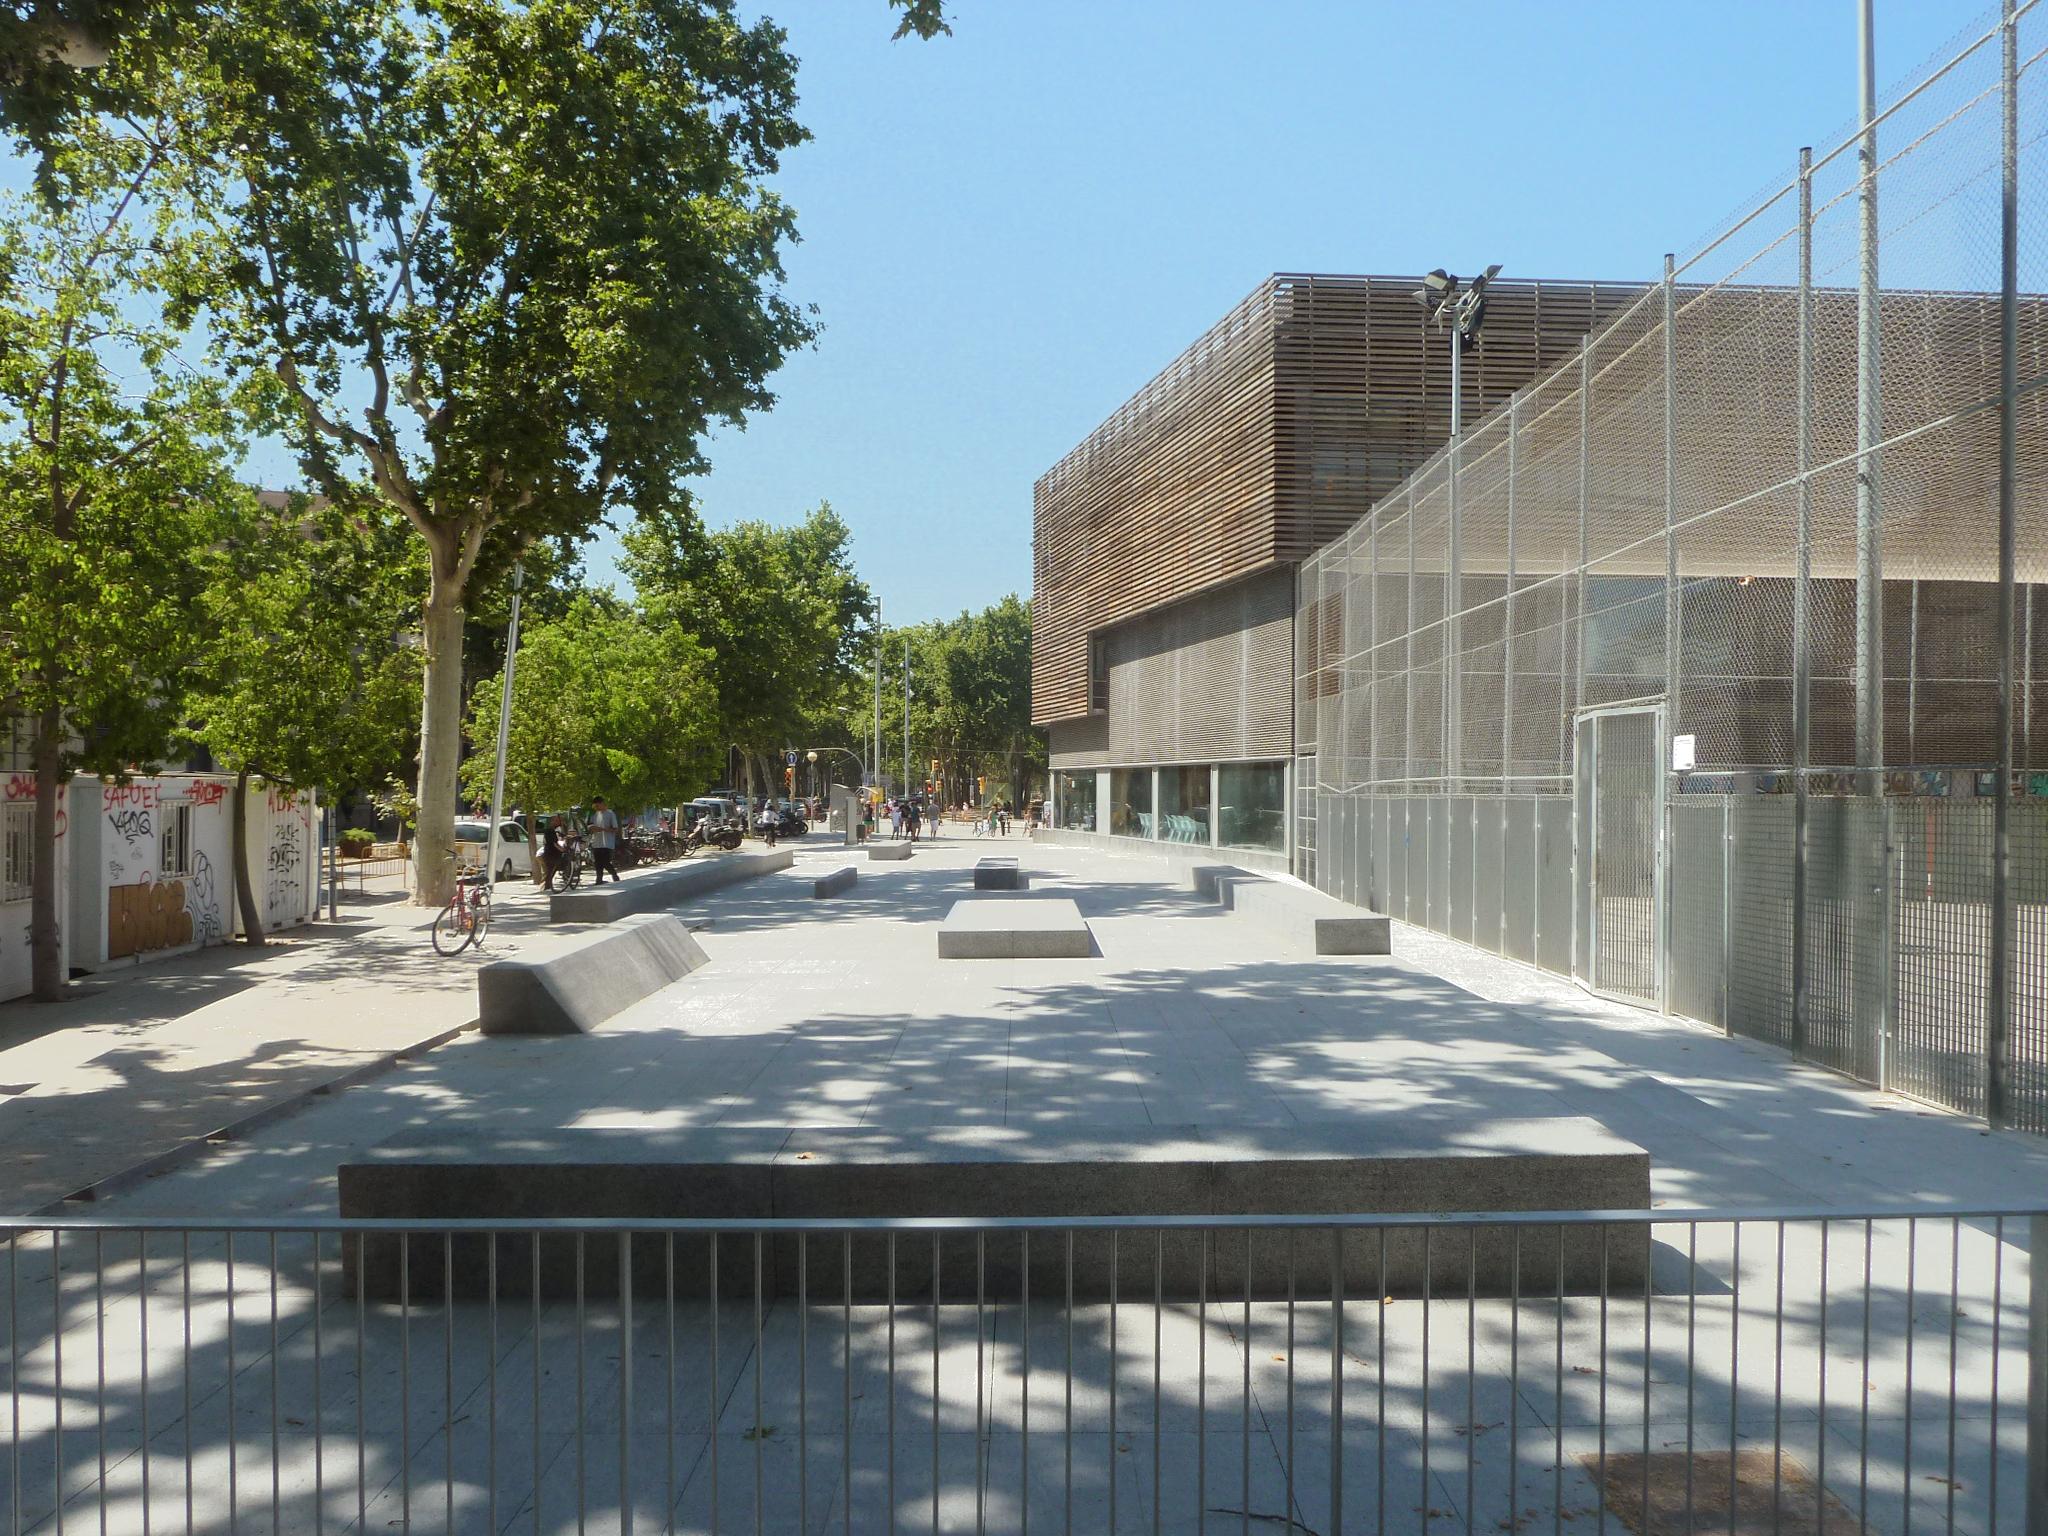 SKATE-ARCHITECTS-BORN-BARCELONA-SKATEPLAZA-PLAZA-P1160305.jpg